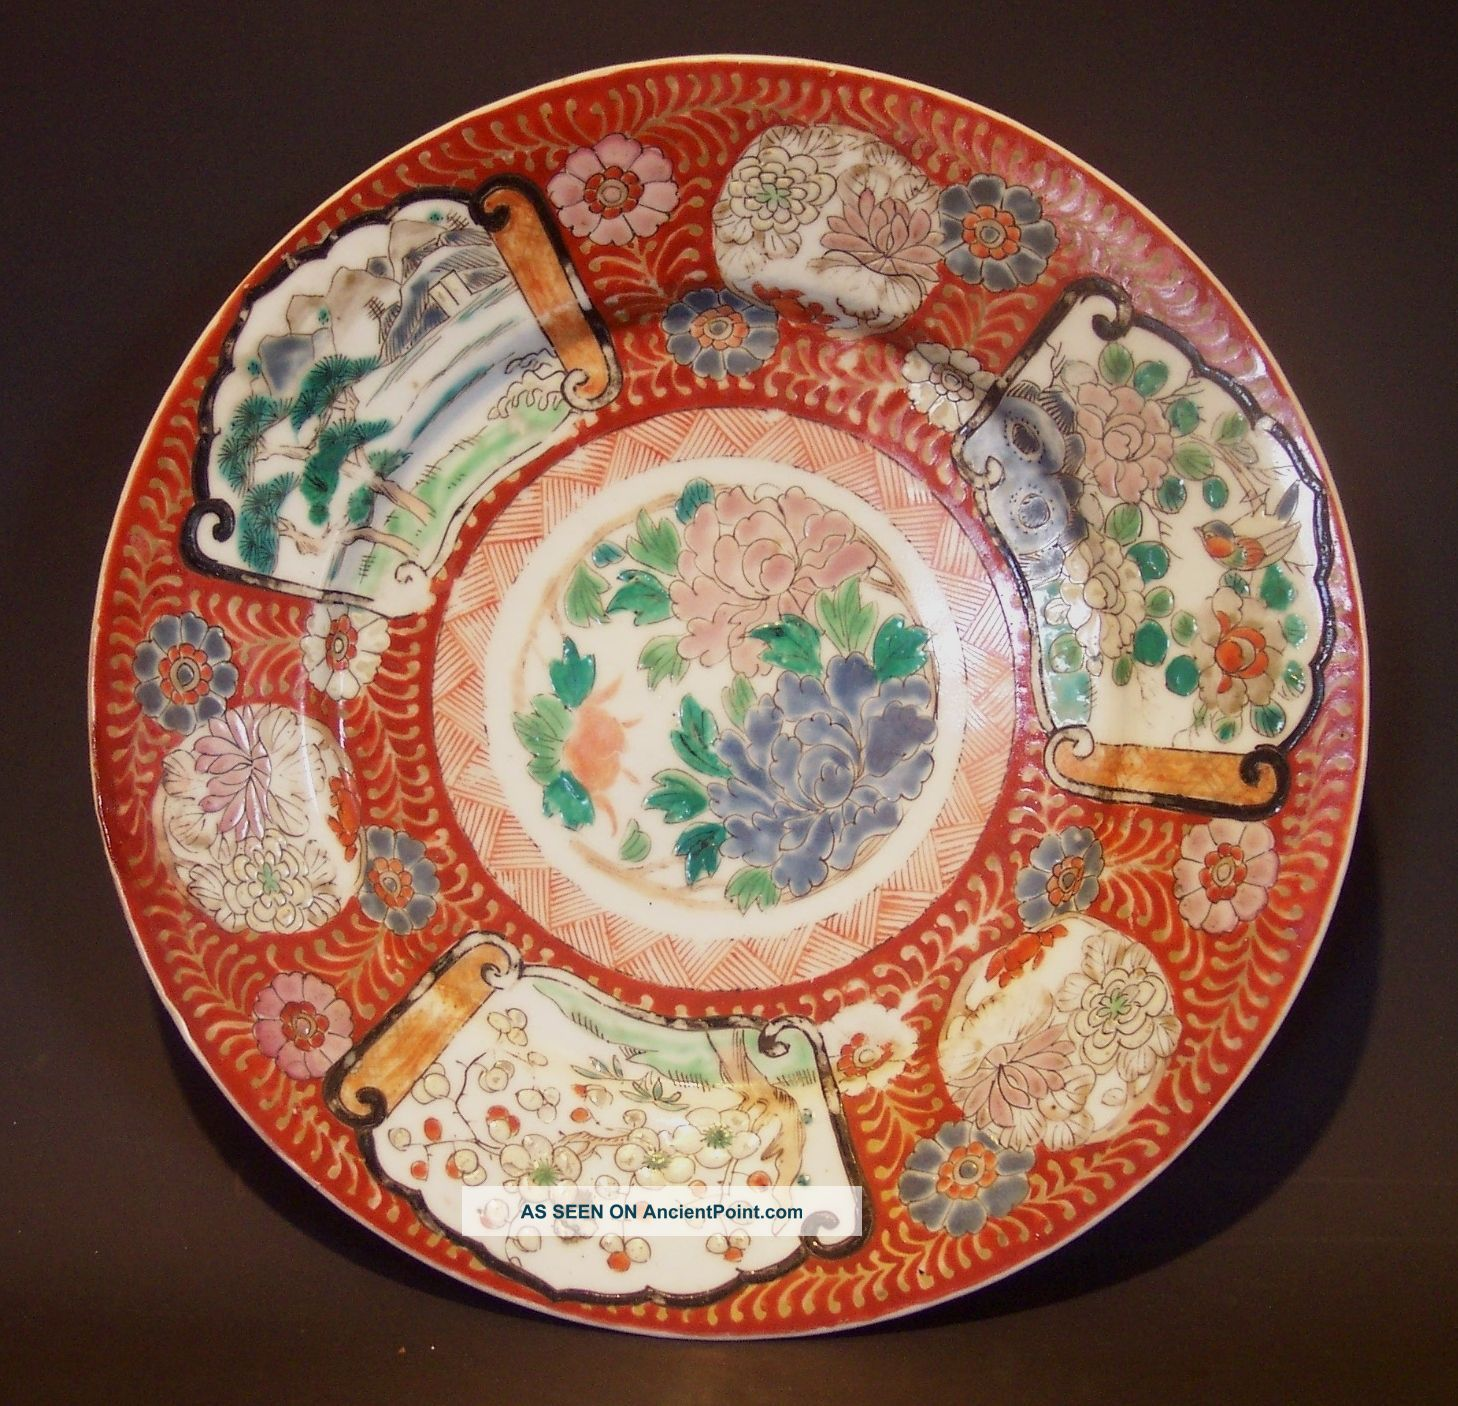 Antique Japanese Plates   Antique Imari Plate Enamel Decorated Porcelain Japanese Charger Old .. & Antique Japanese Plates   Antique Imari Plate Enamel Decorated ...